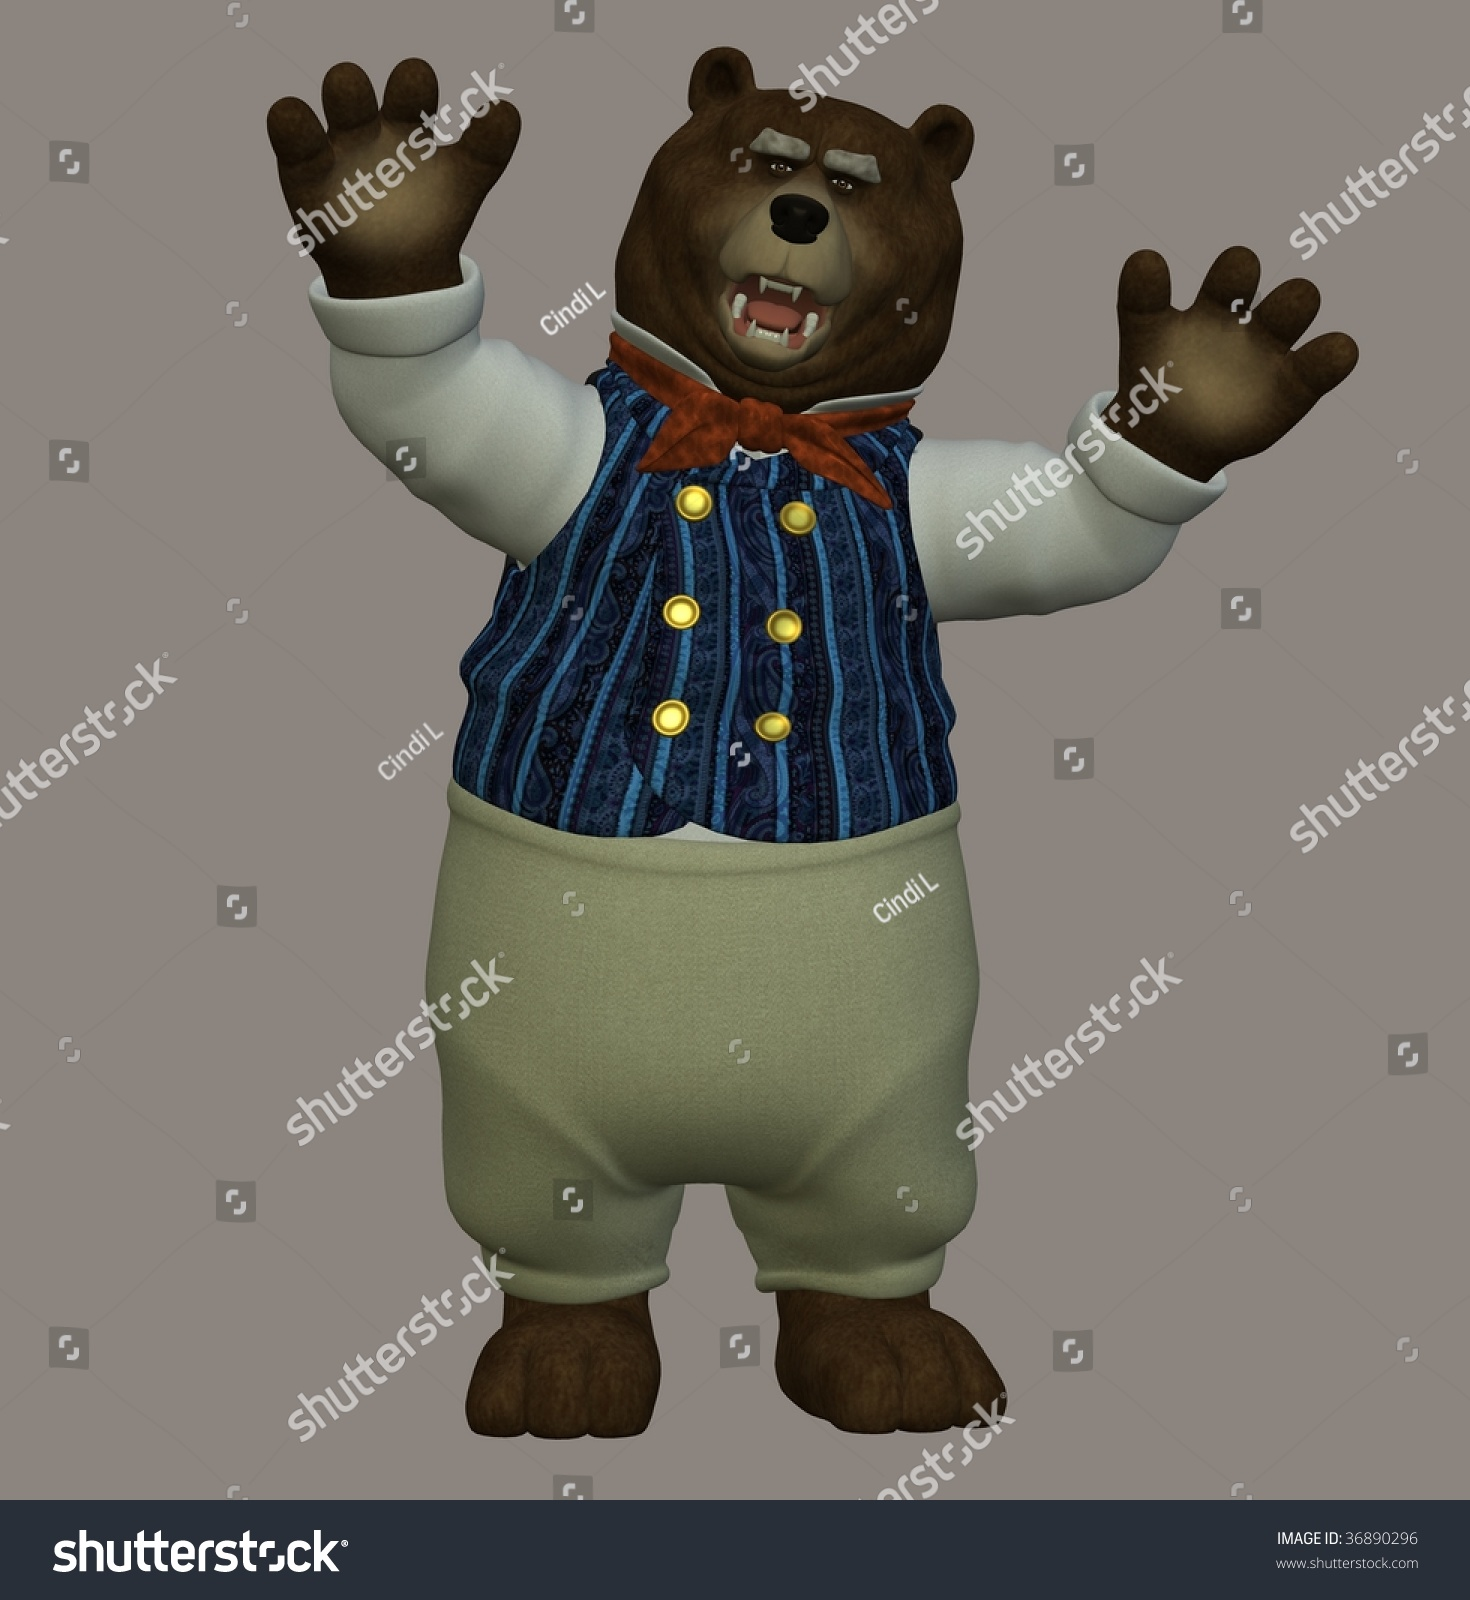 papa bear nursery rhyme three bears stock illustration 36890296